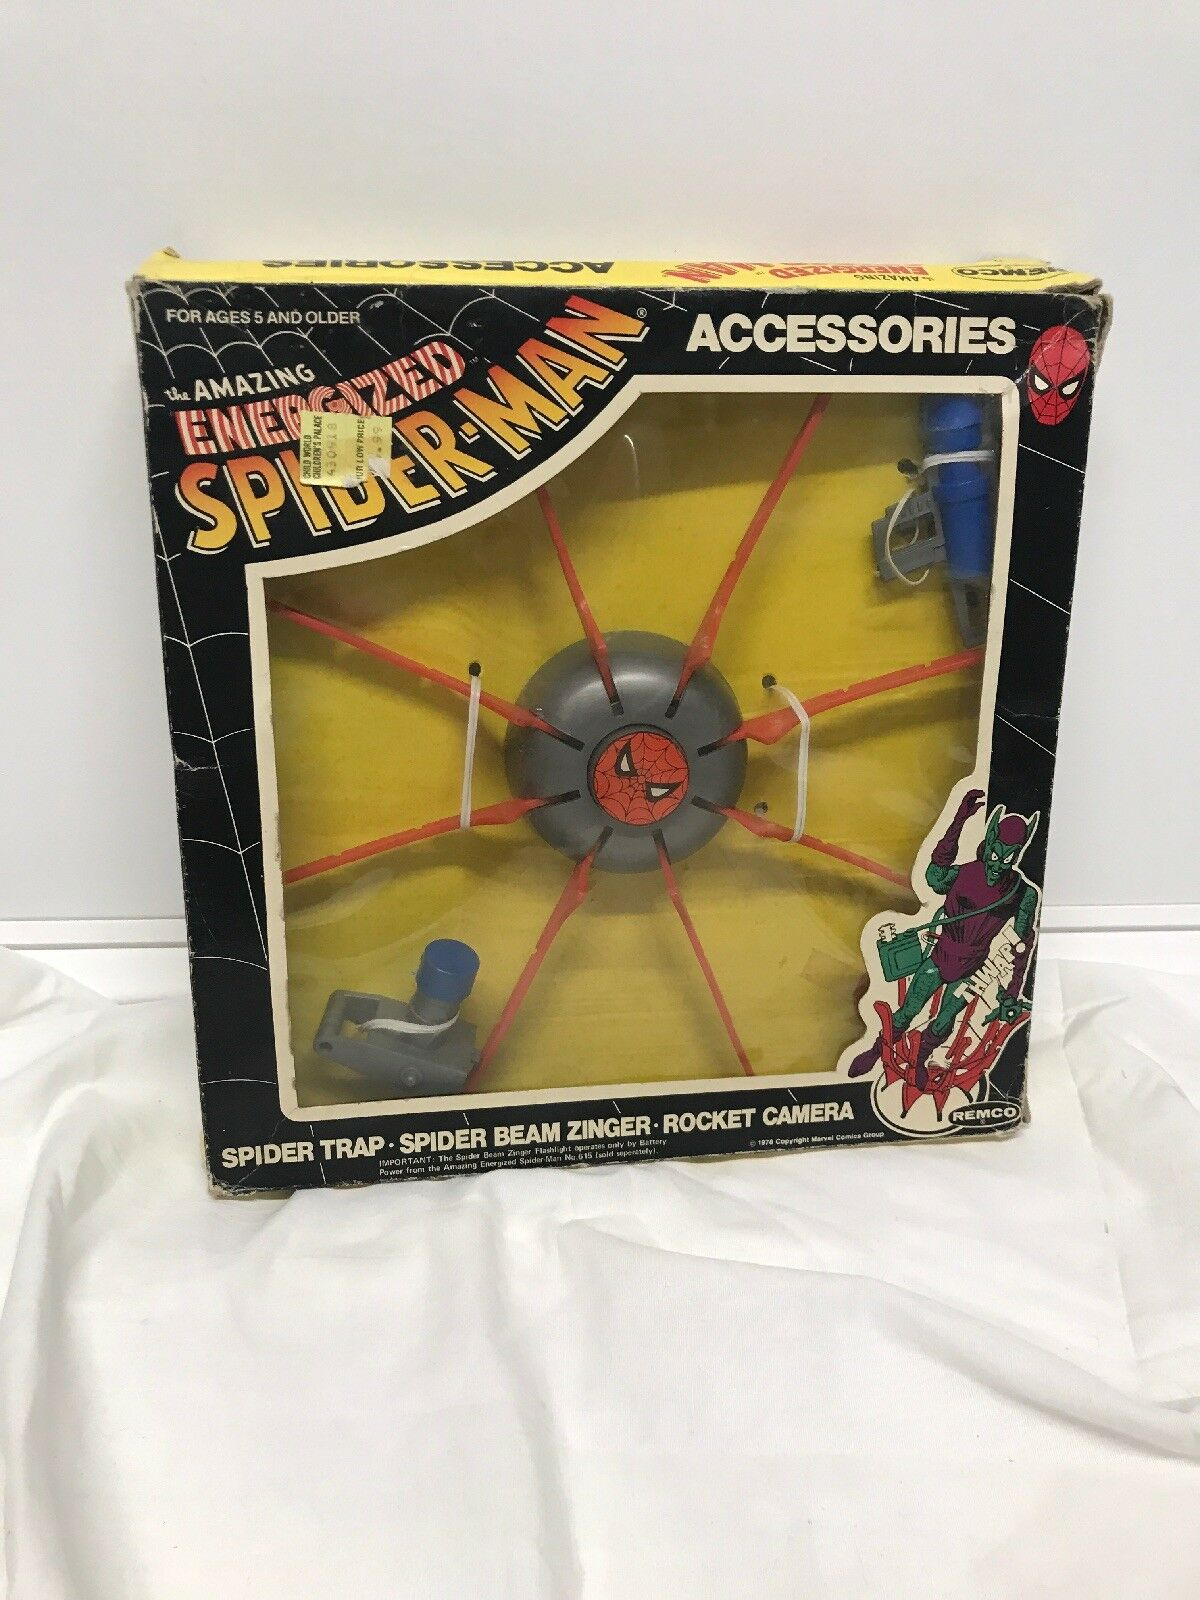 Vintage 1978 Remco THE AMAZING SPIDER-MAN ACCESSORIES Spider Trap